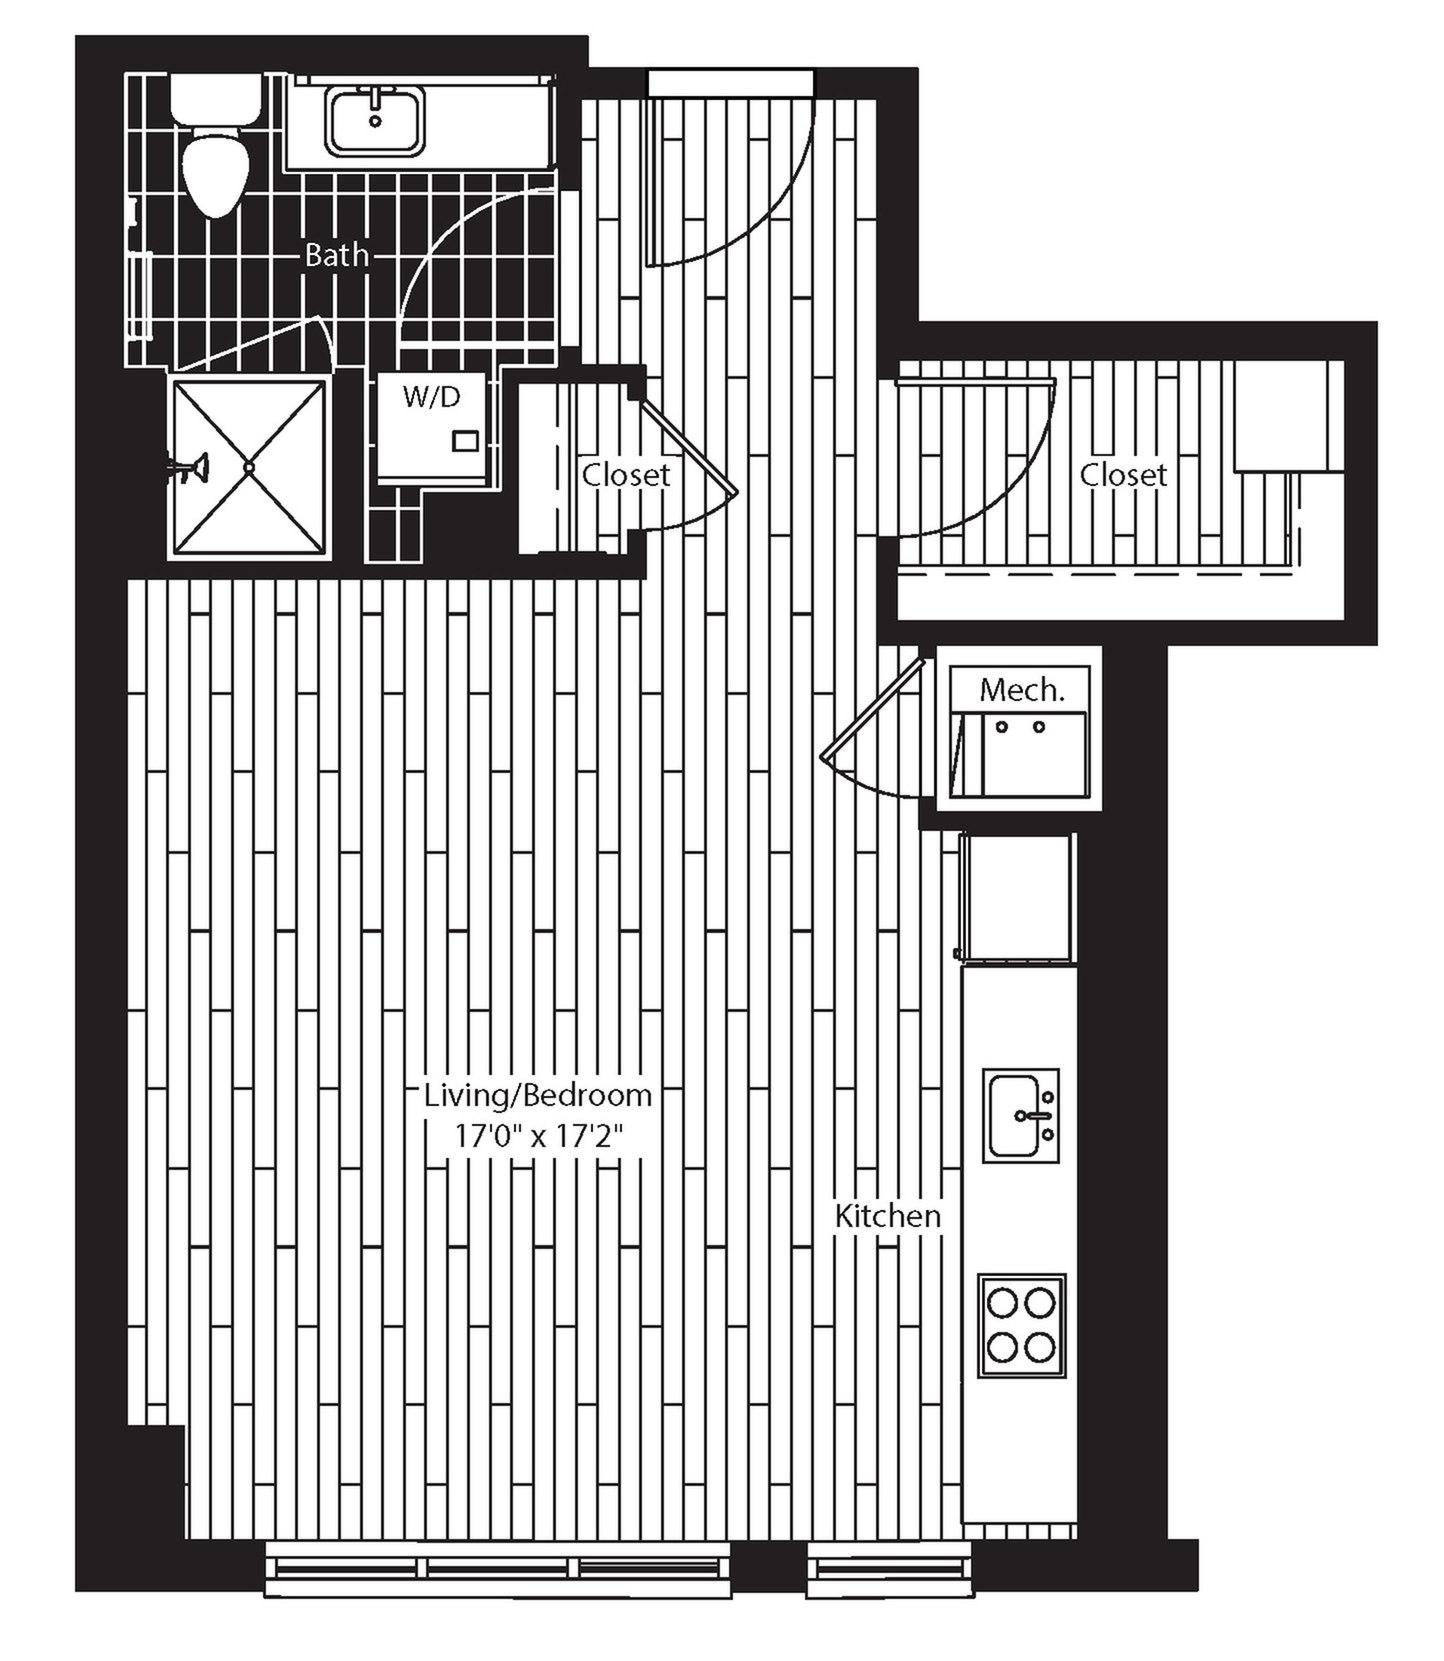 492 square foot studio one bath floor plan image